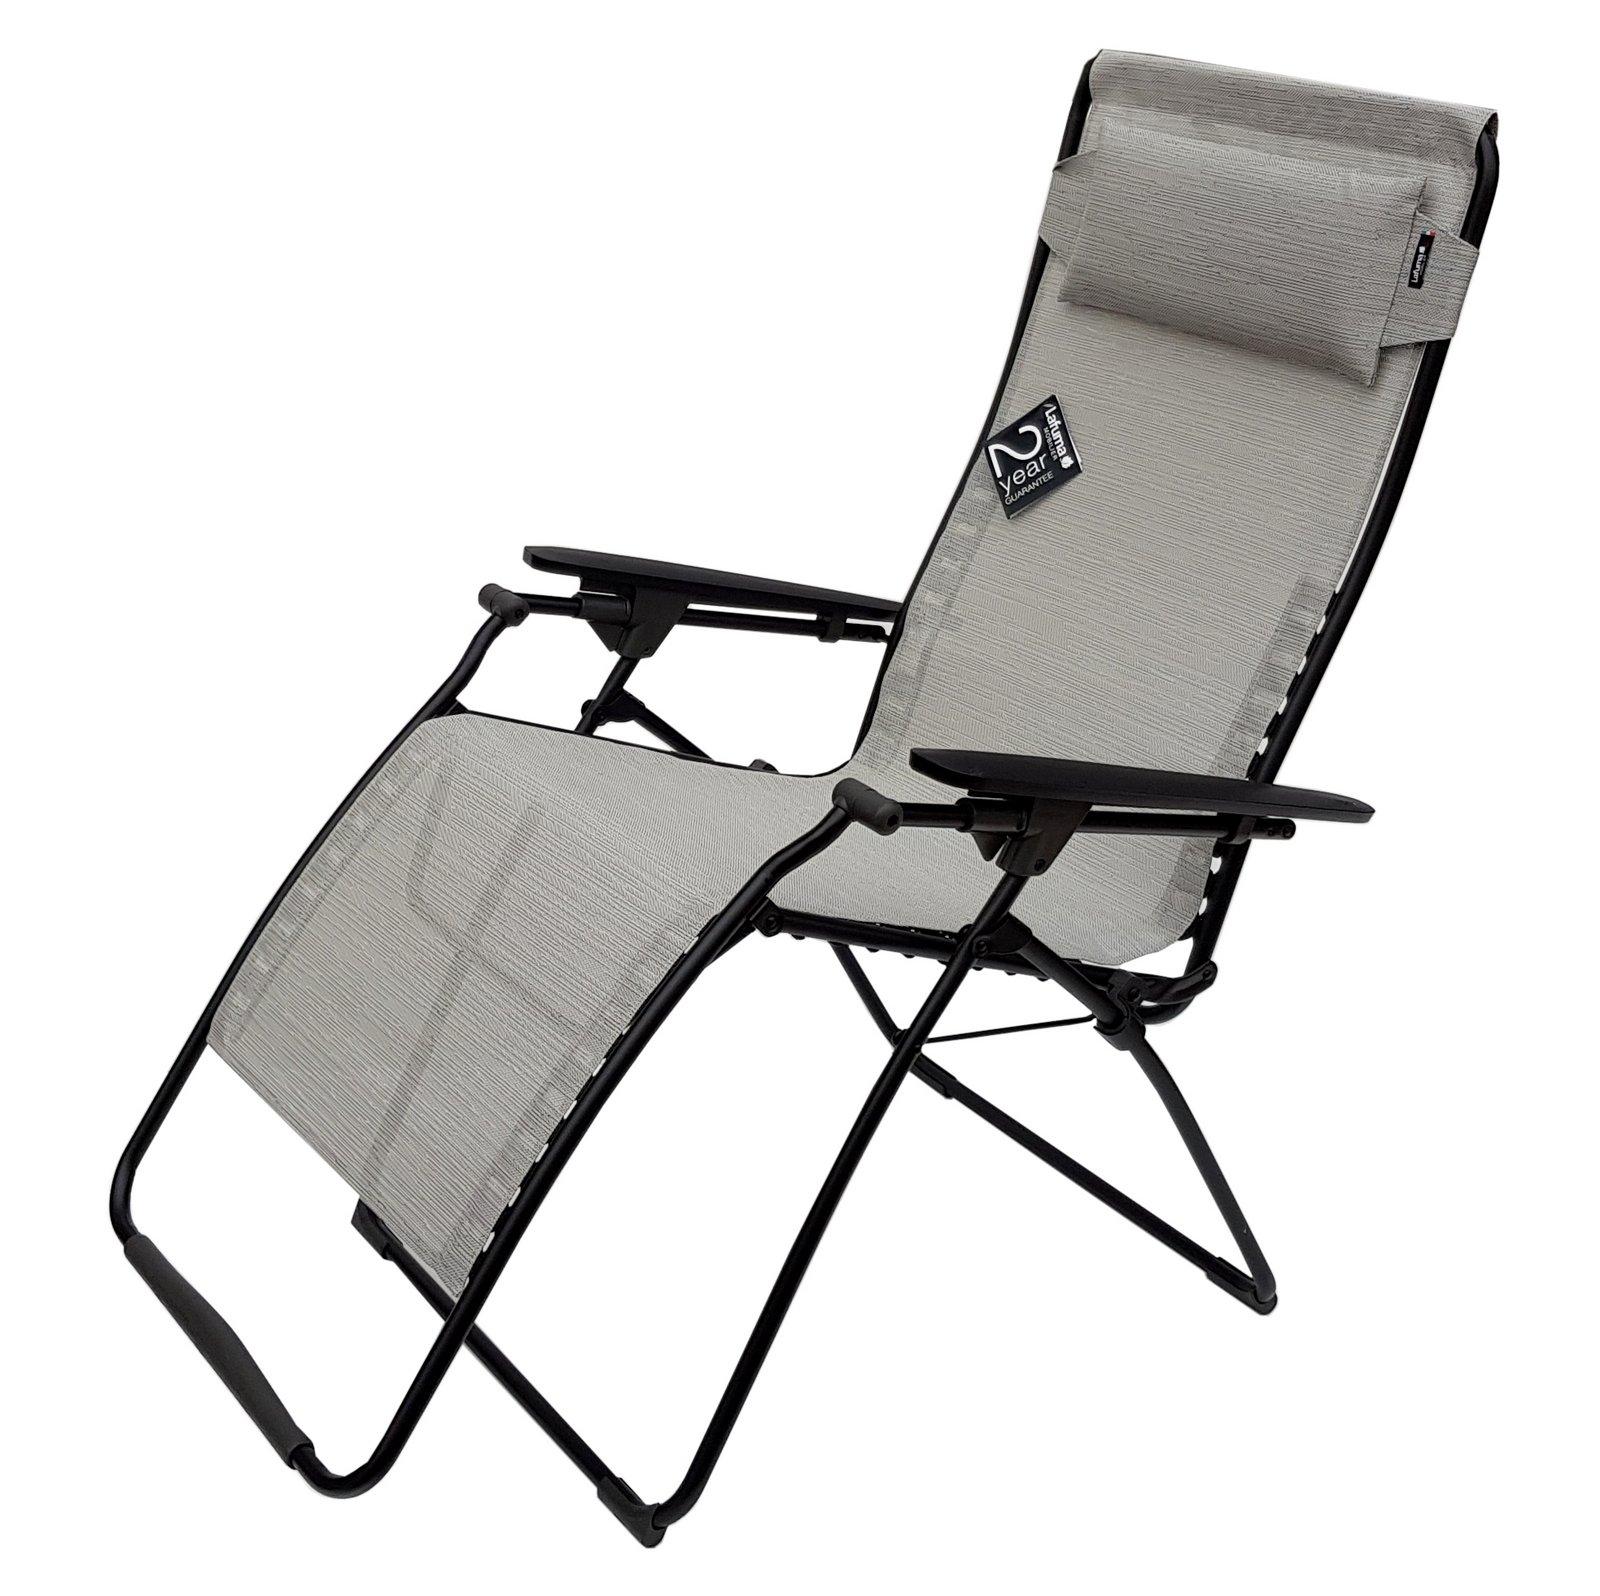 lafuma futura liegestuhl clipp relaxliege batyline grau galet ebay. Black Bedroom Furniture Sets. Home Design Ideas